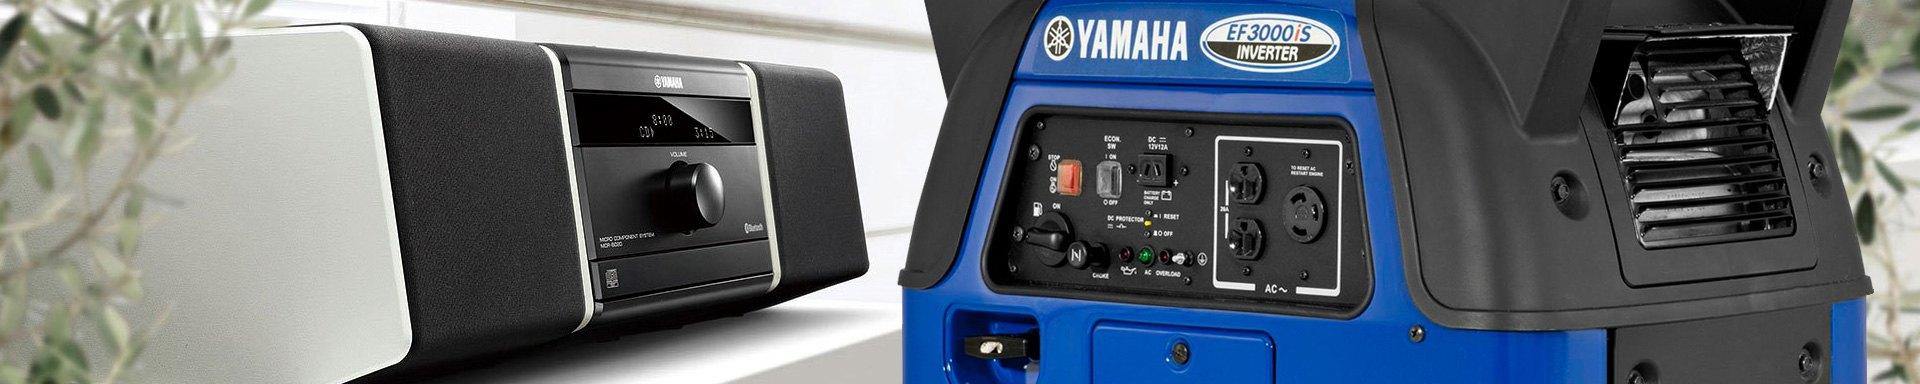 Yamaha™   Generators, Pressure Washers - TOOLSiD com